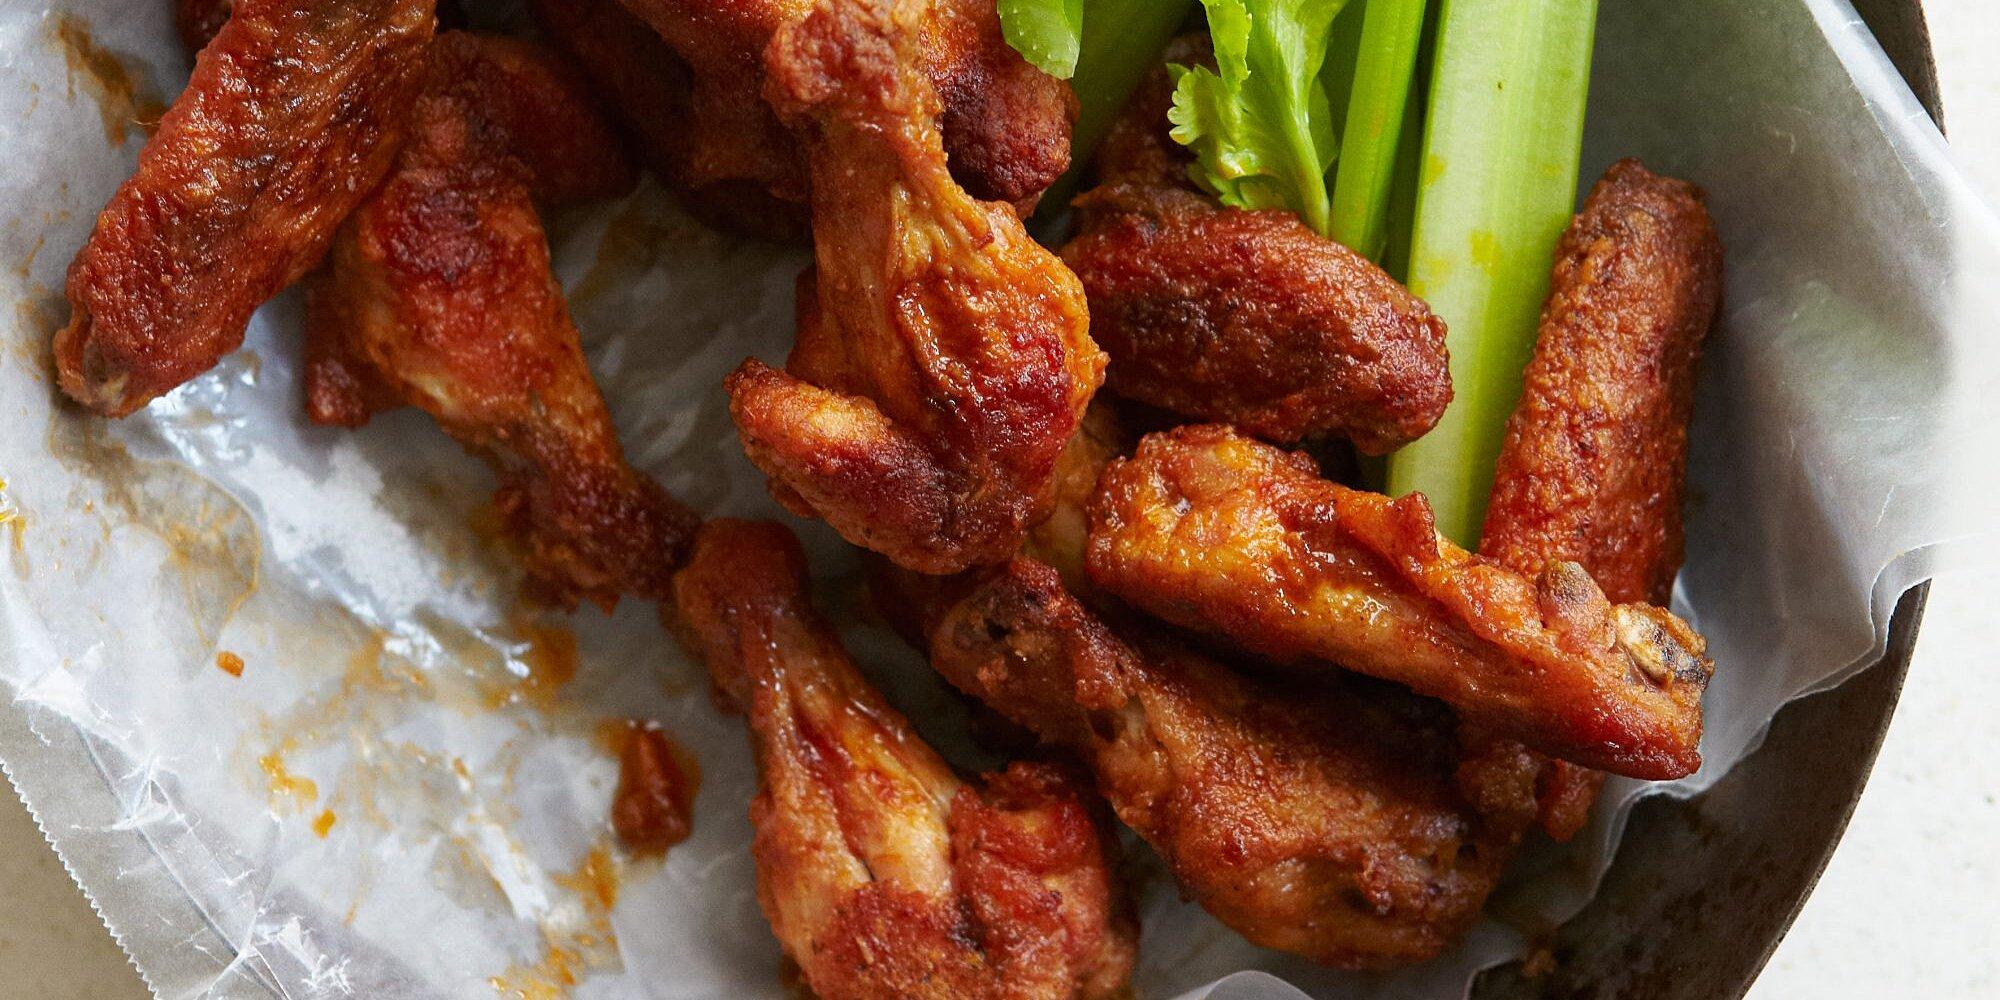 Old Bay Hot Wings Recipe